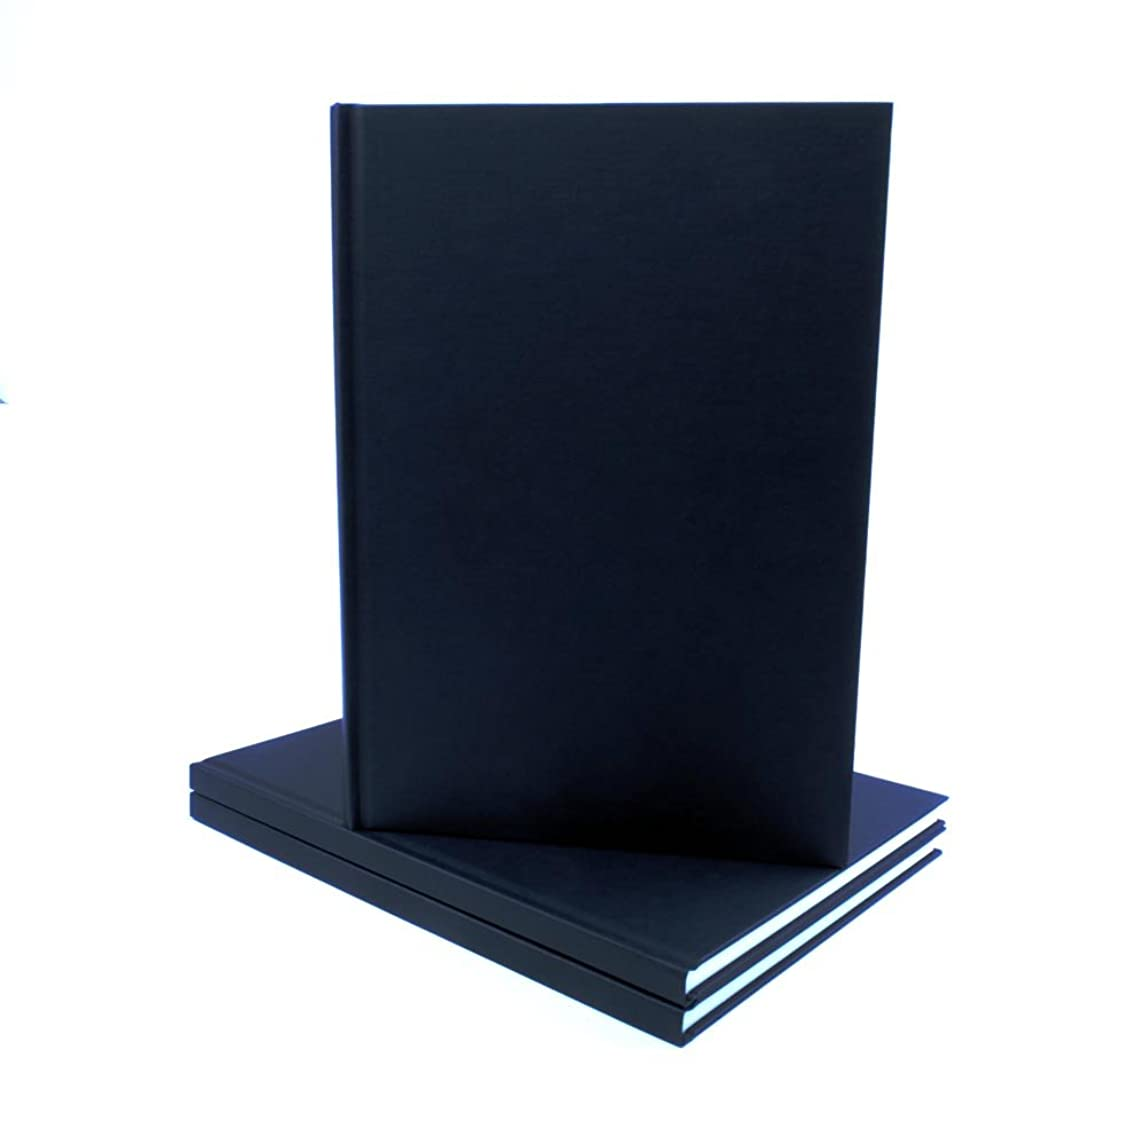 SEAWHITE Black Cloth Hardback Artists Sketchbook 140gsm Portrait A4-210x297mm qqhwkiifgt1